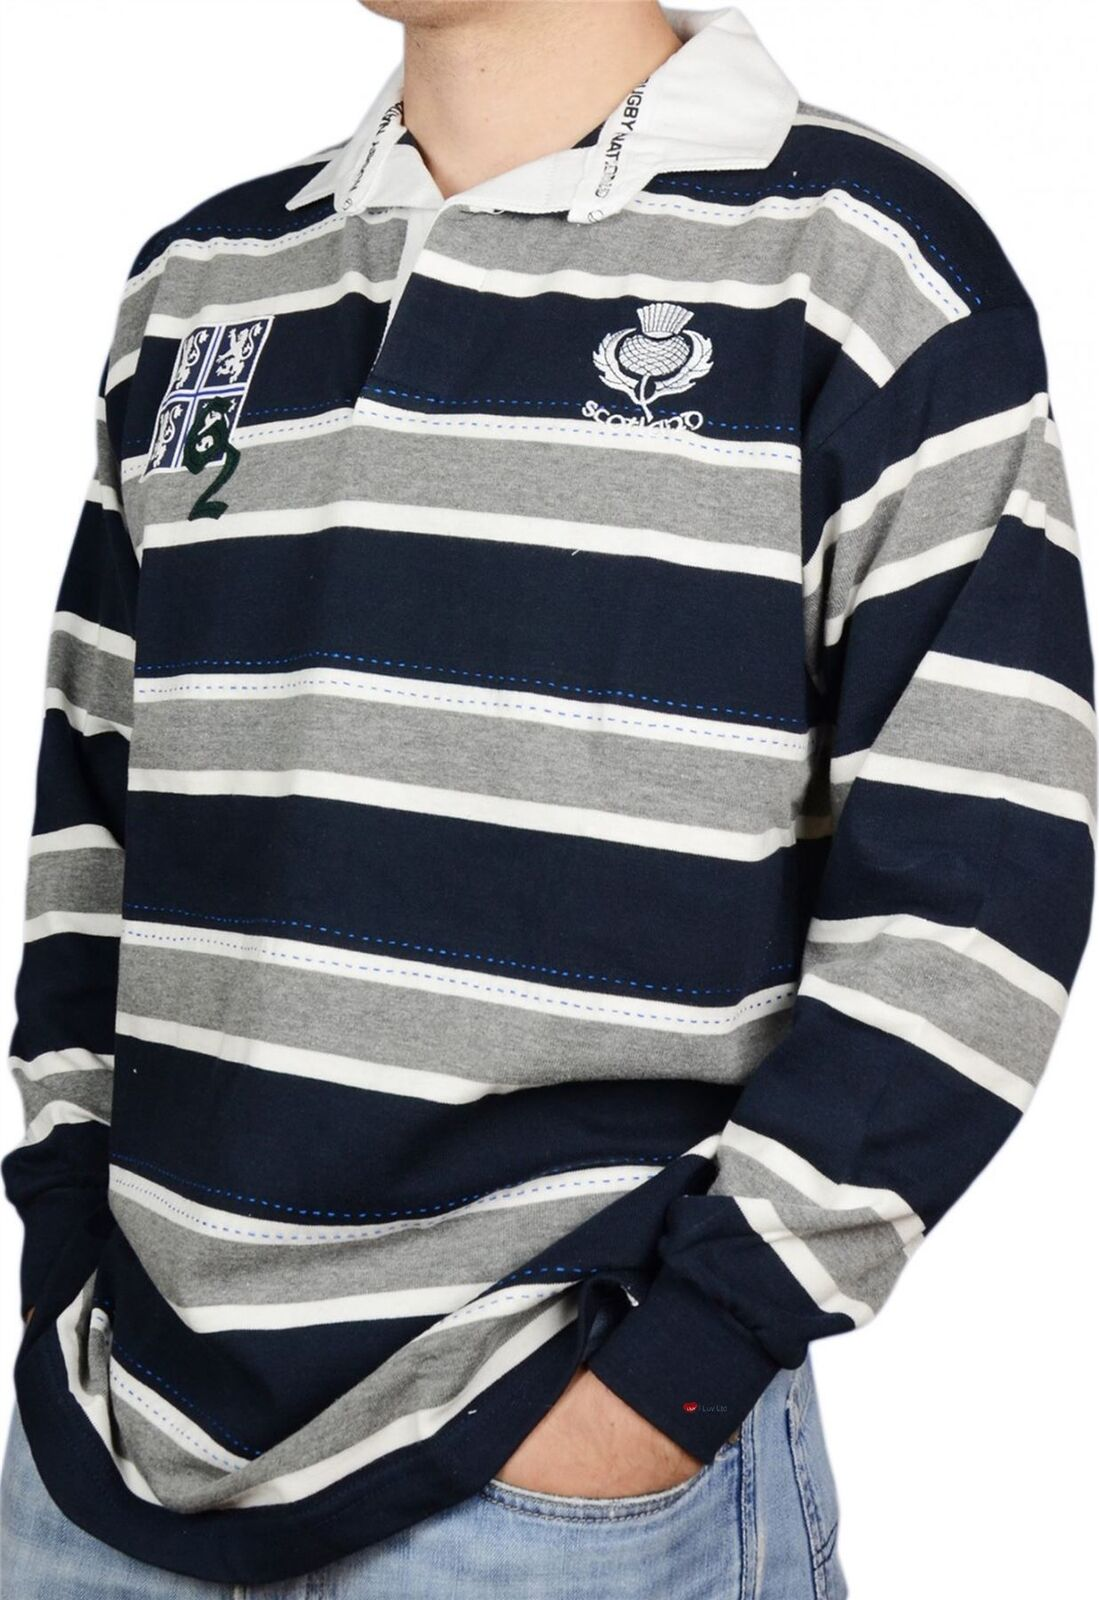 Scottish Rugby Camicia Da Uomo Edimburgo Edimburgo Edimburgo 62 High Design Grigio E Blu Scuro Piccola 27f7be